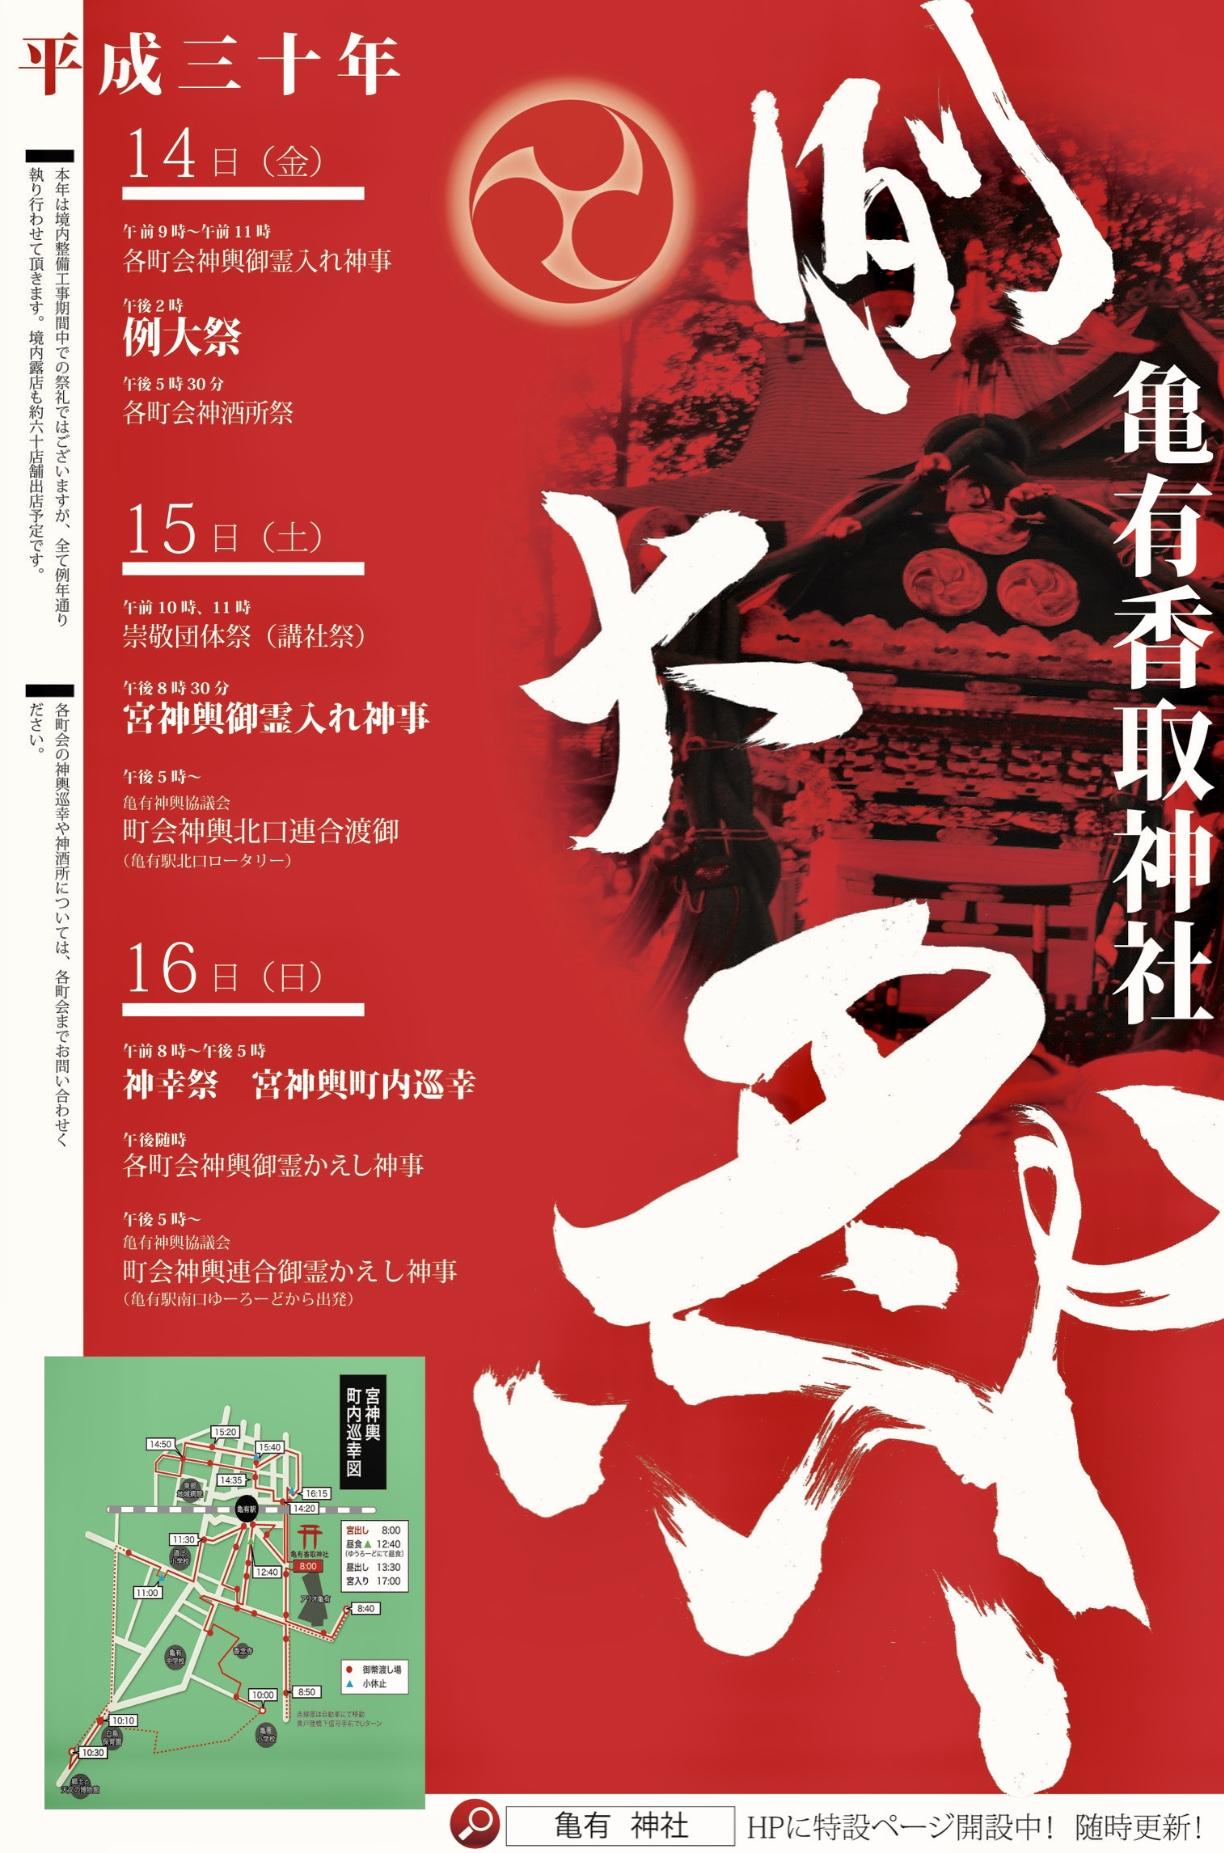 平成30年例大祭ポスター完成!